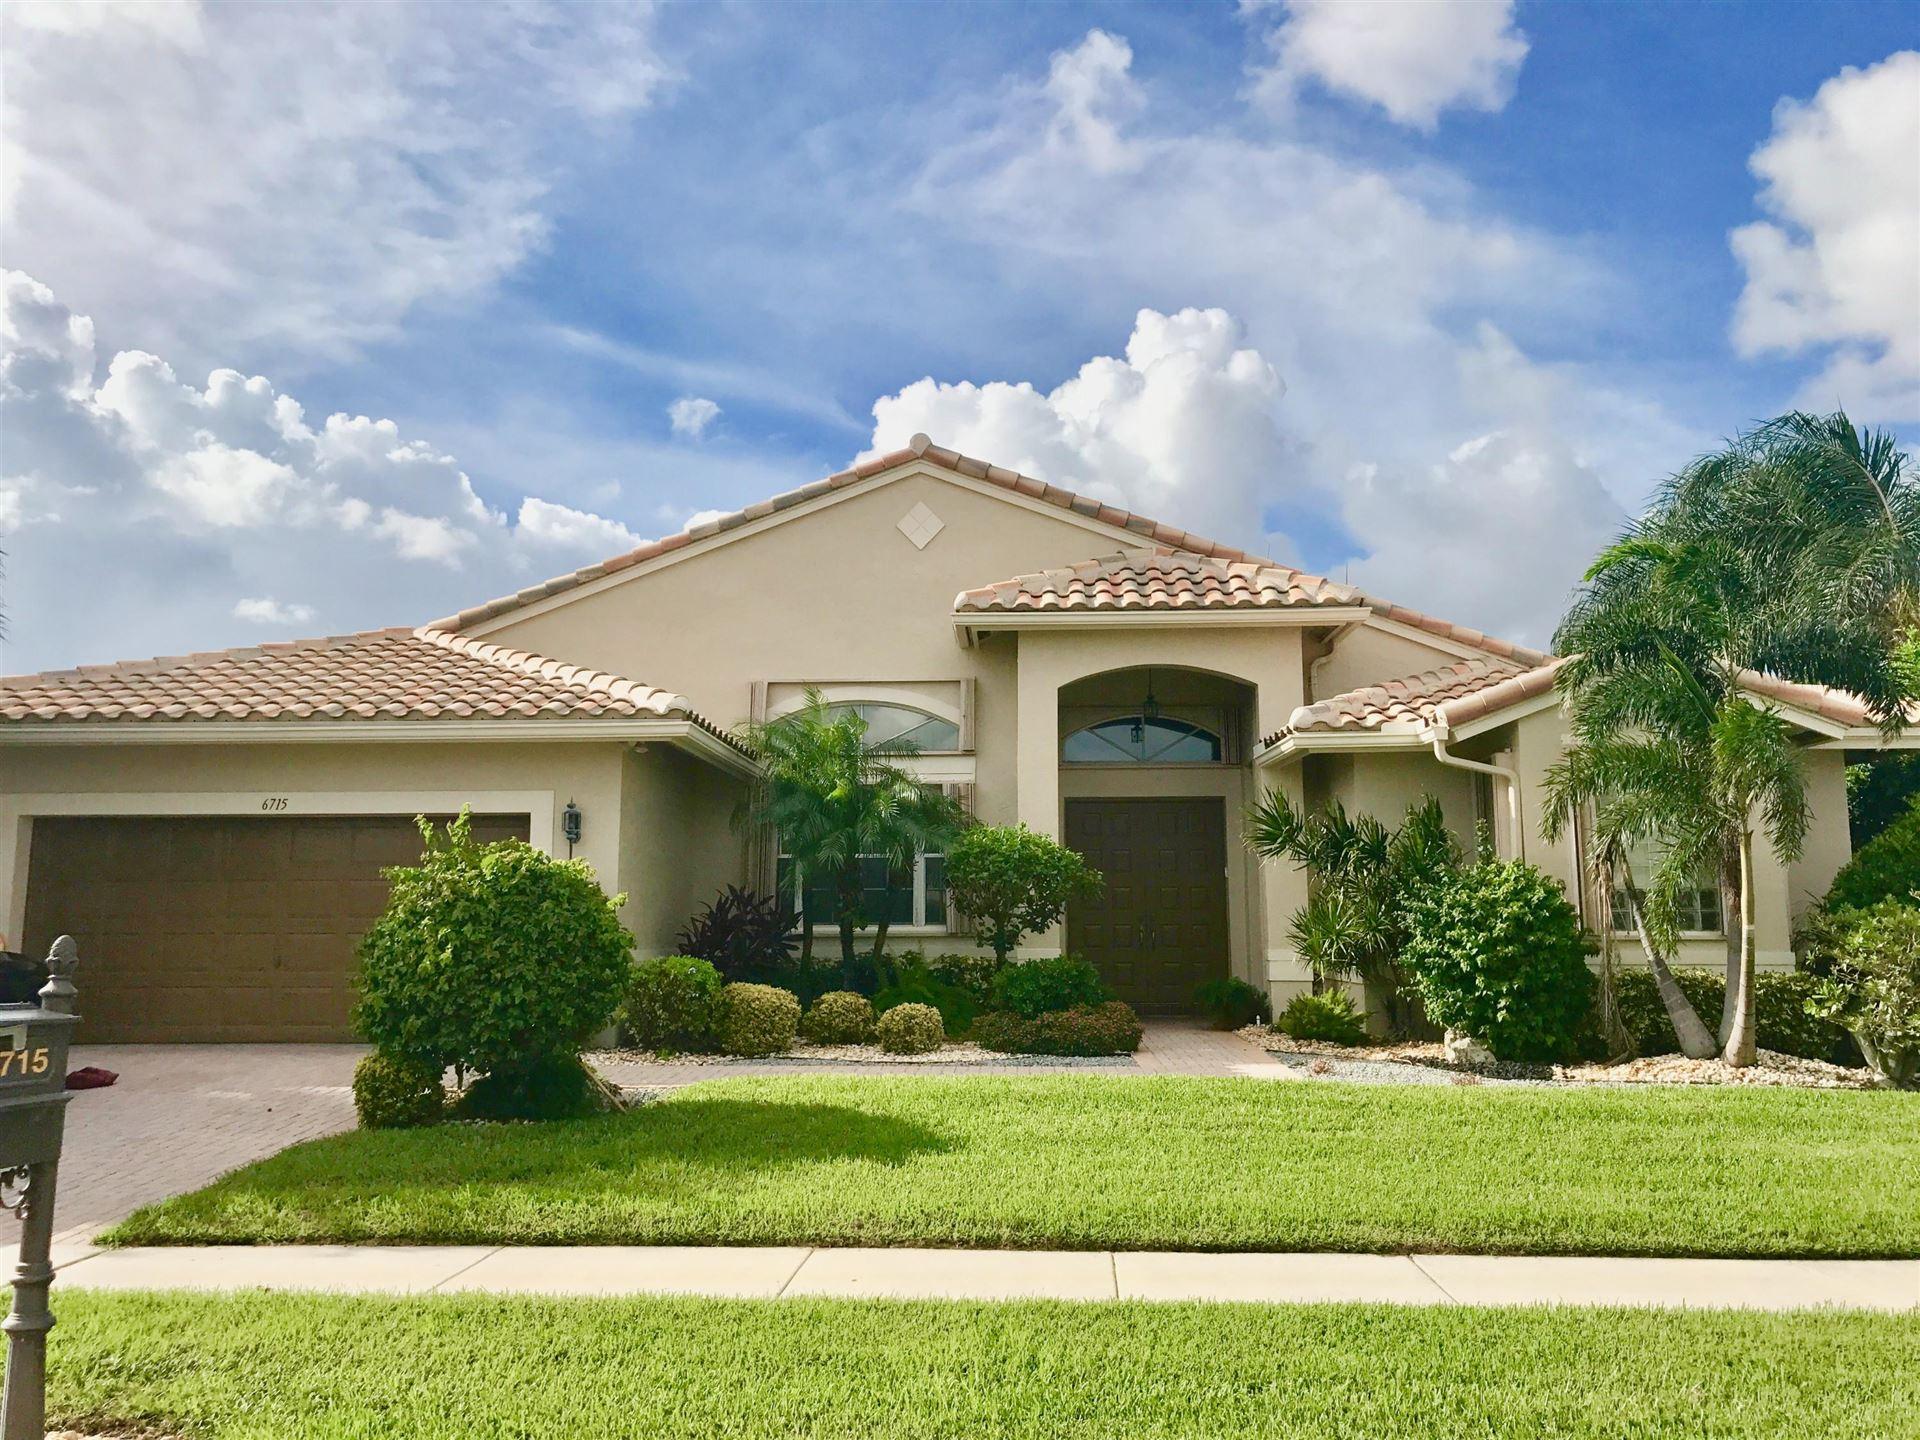 6715 Chimere Terrace, Boynton Beach, FL 33437 - #: RX-10713727